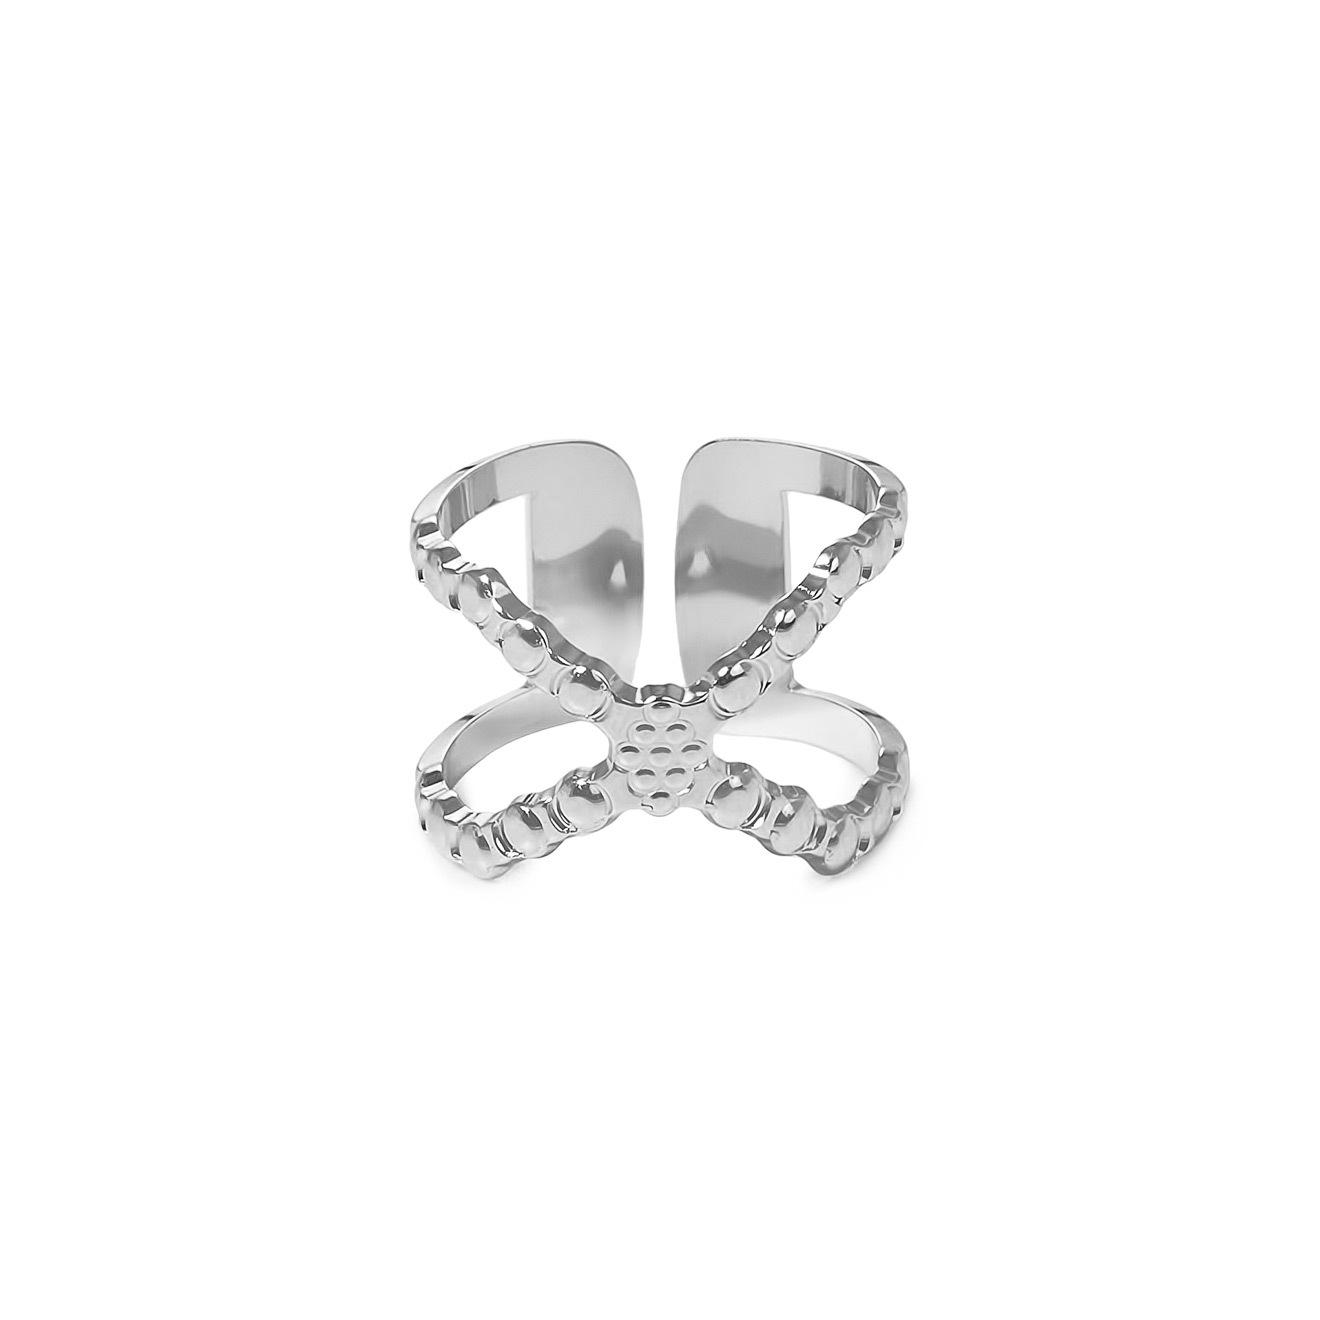 Mya Bay Покрытое серебром кольцо «Connexion»